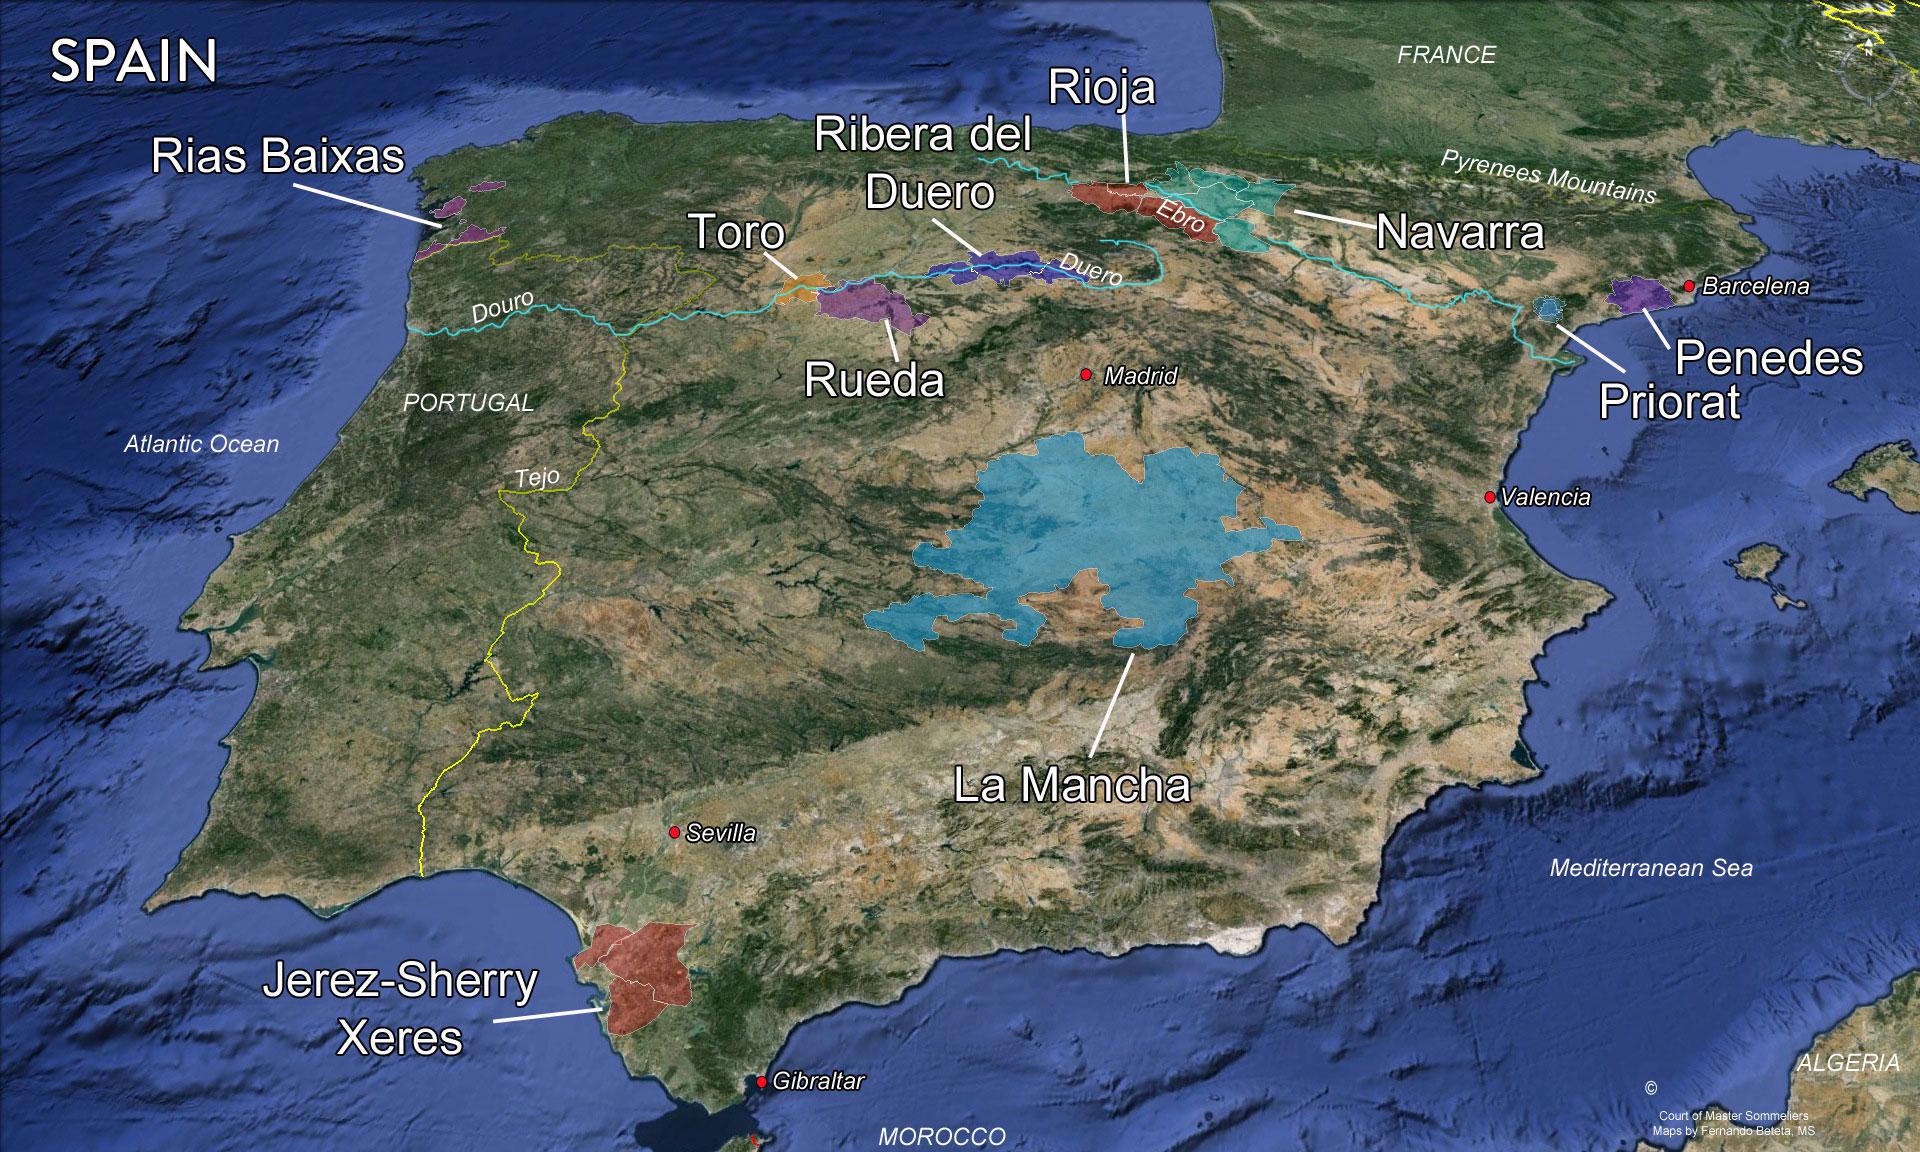 Spain-Overview-2.jpg